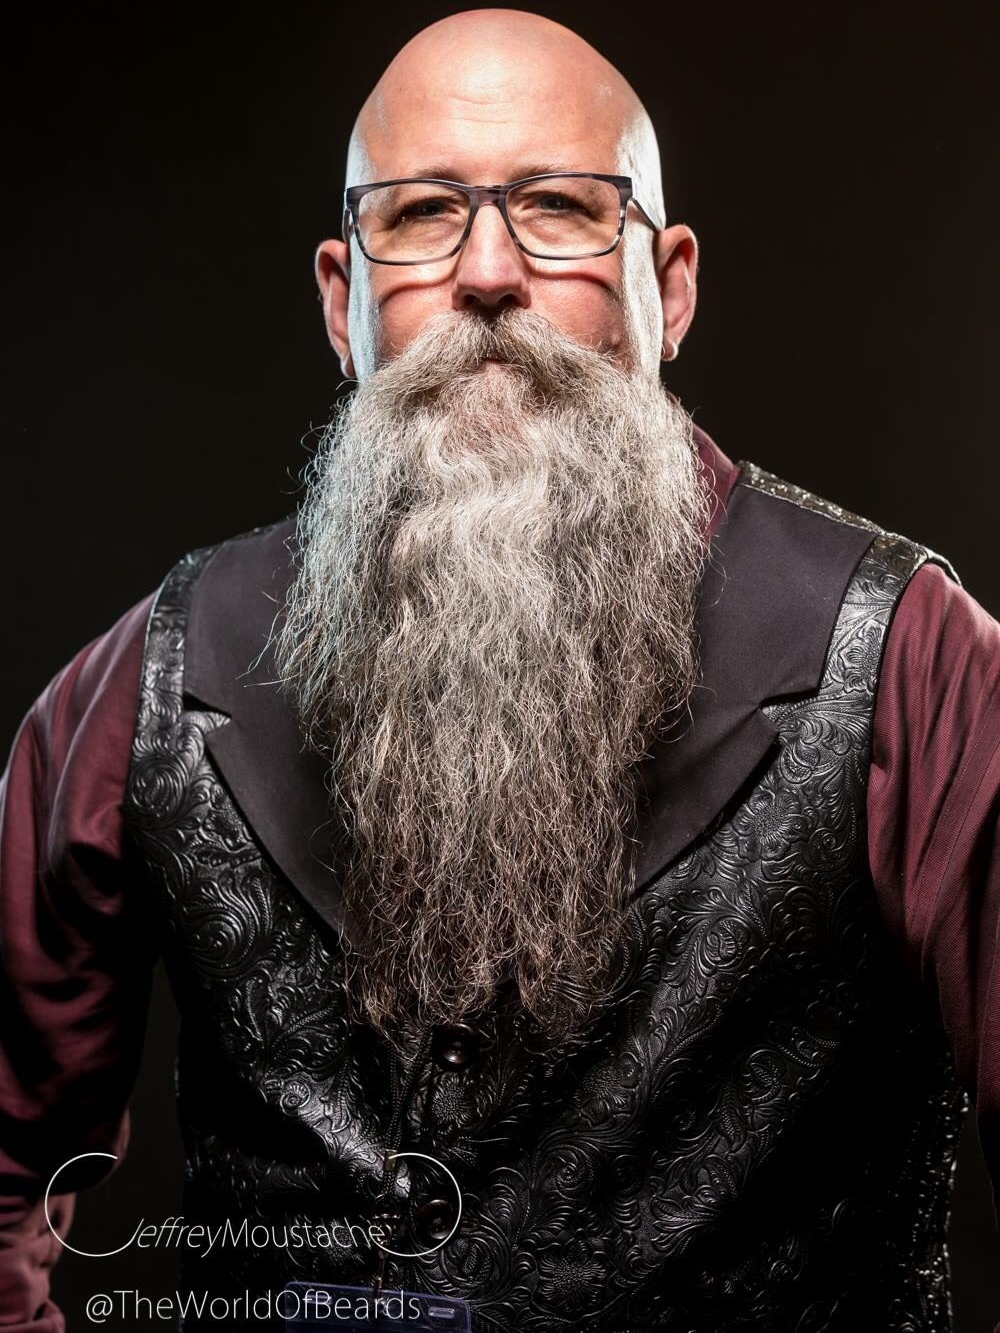 Jeff Raye Sergeant-at-Arms   photo:    Jeffrey Moustache | The World of Beards